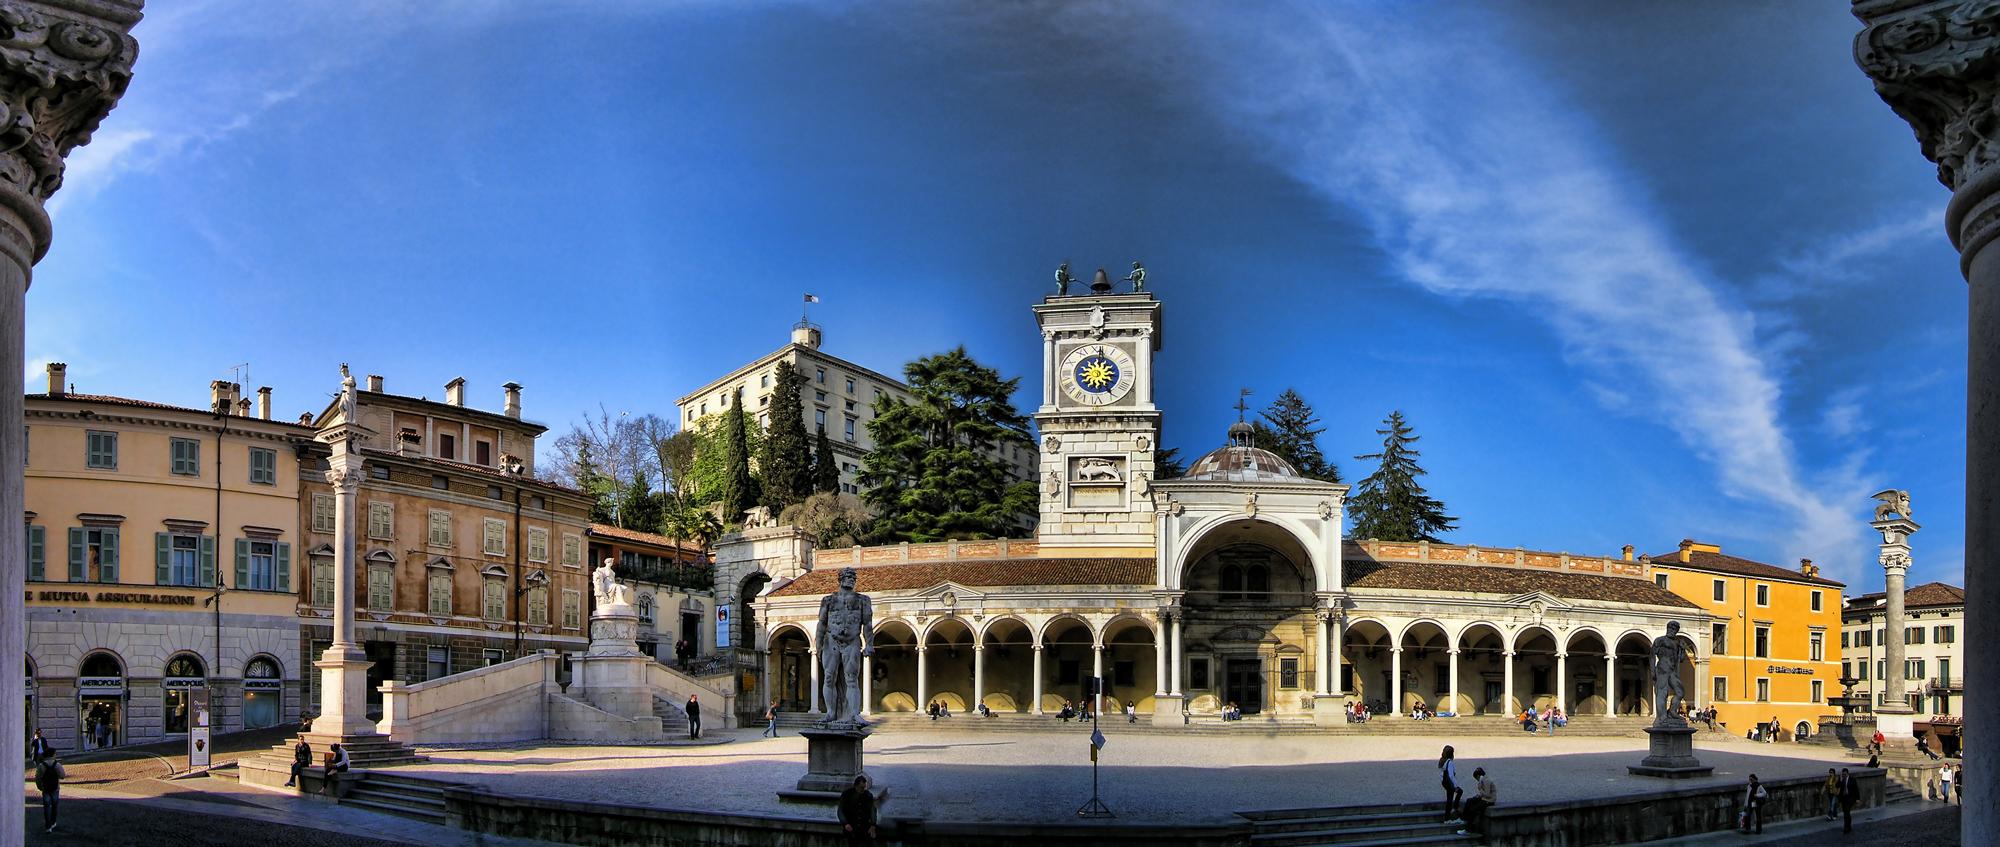 Giardino In Città Udine udine | cosa vedere a udine